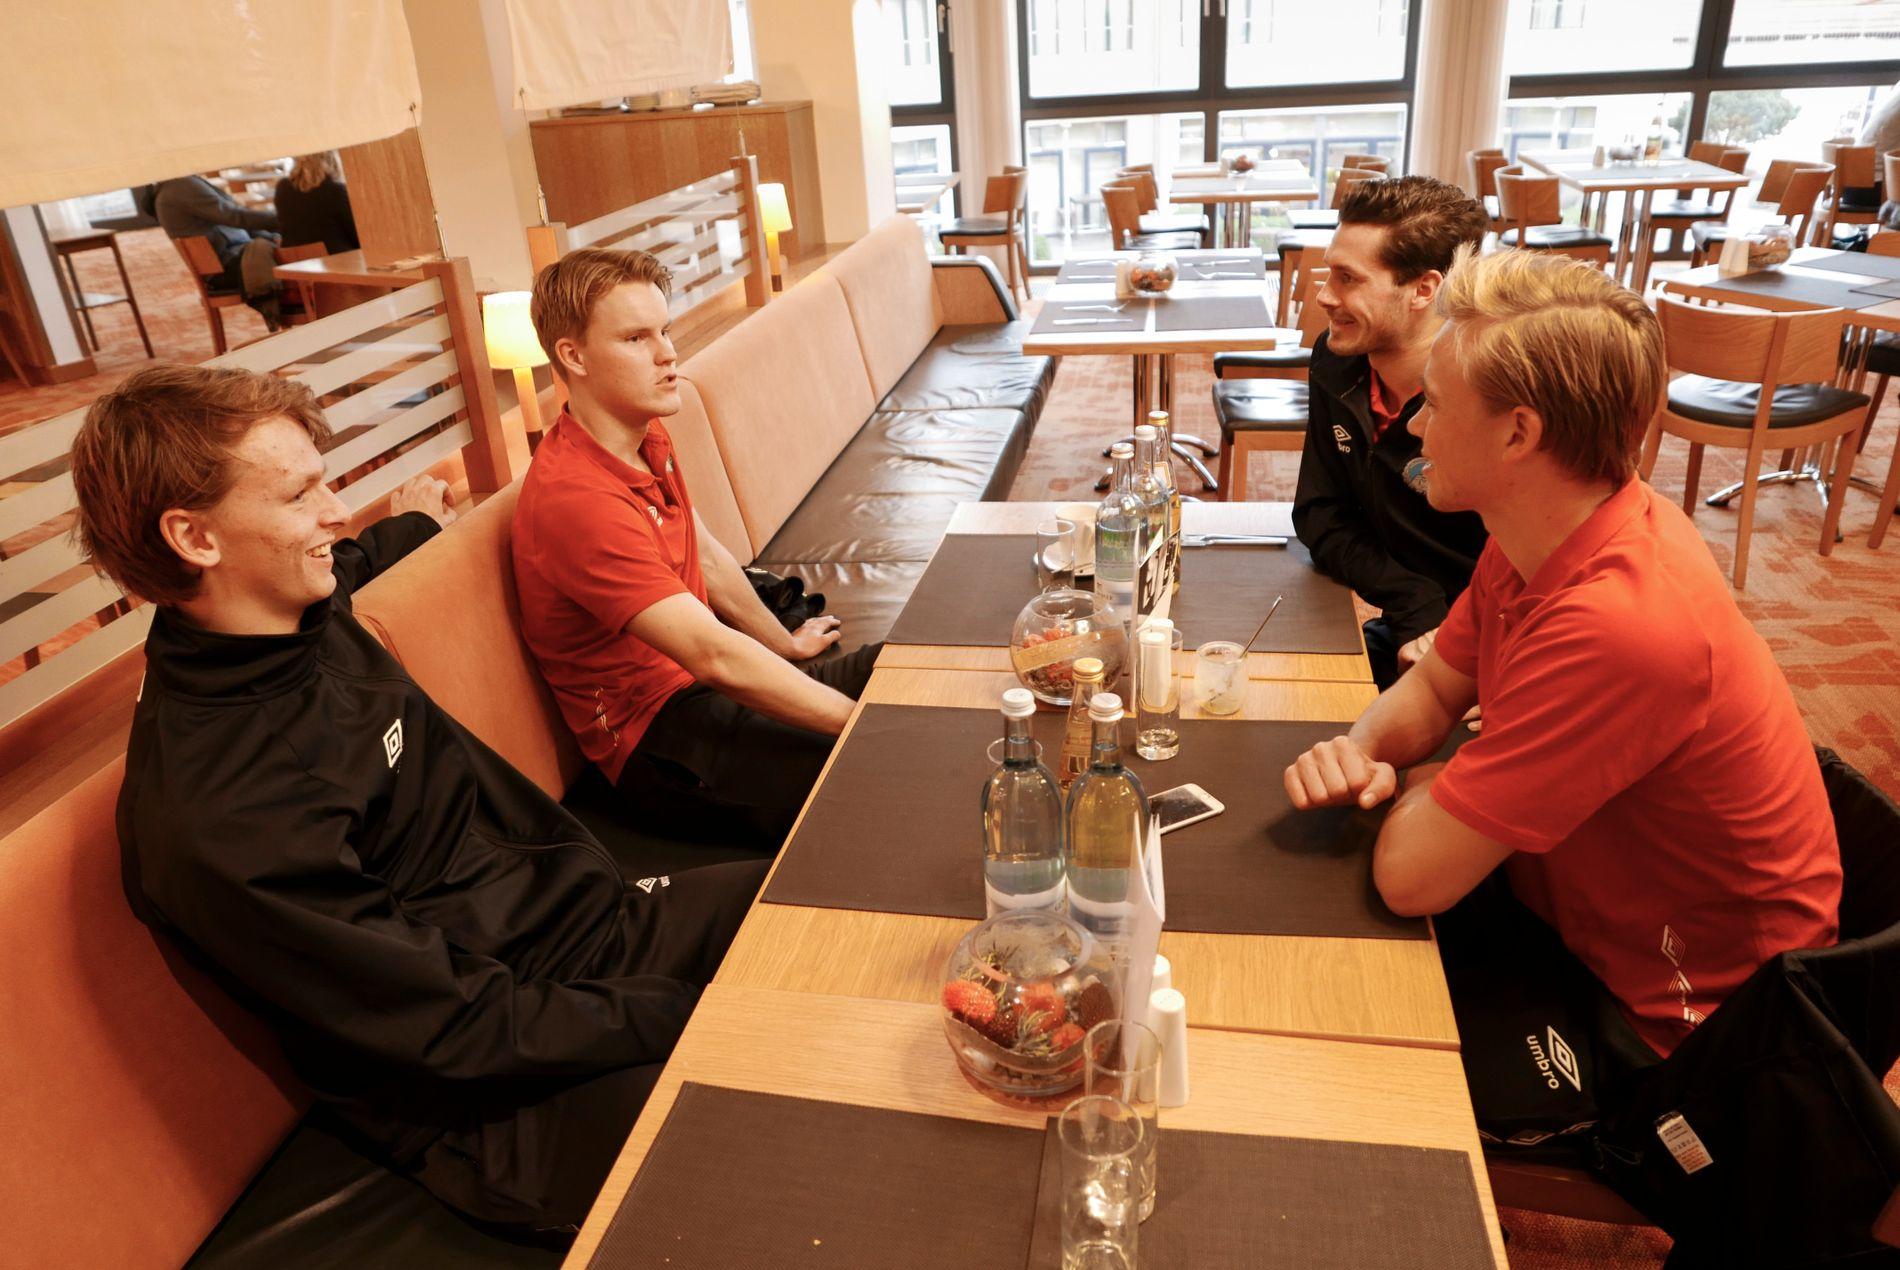 LUNSJ: Kongsvinger-spillerne Adrian Ovlien (til venstre), Harald Holter, Fredrik Mani Pålerud og Martin Ellingsen (nå i Molde) var samlet på spillerhotellet i Tyskland på samling i 2016.